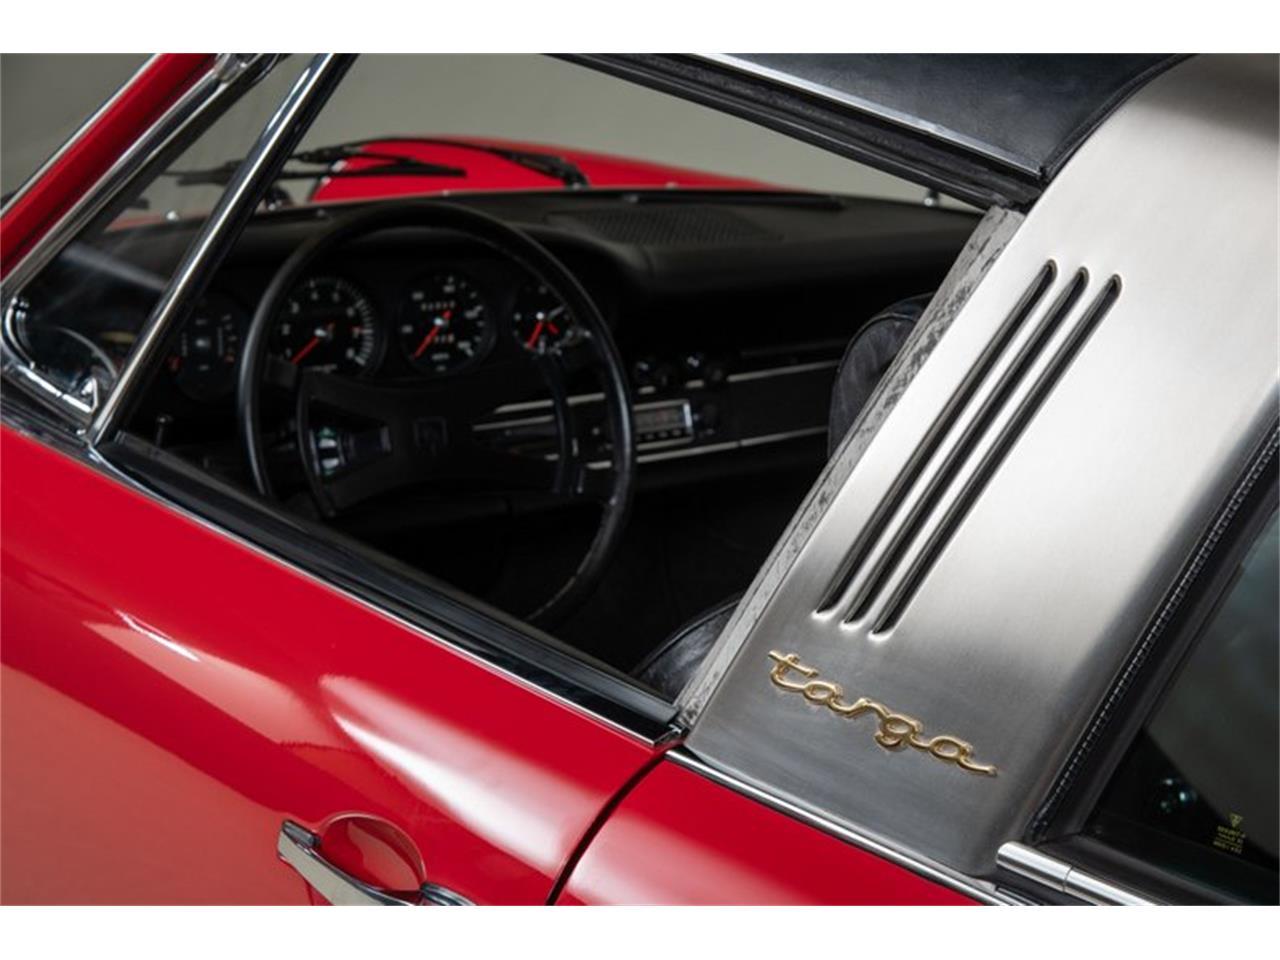 1969 Porsche 911 (CC-1321597) for sale in Scotts Valley, California